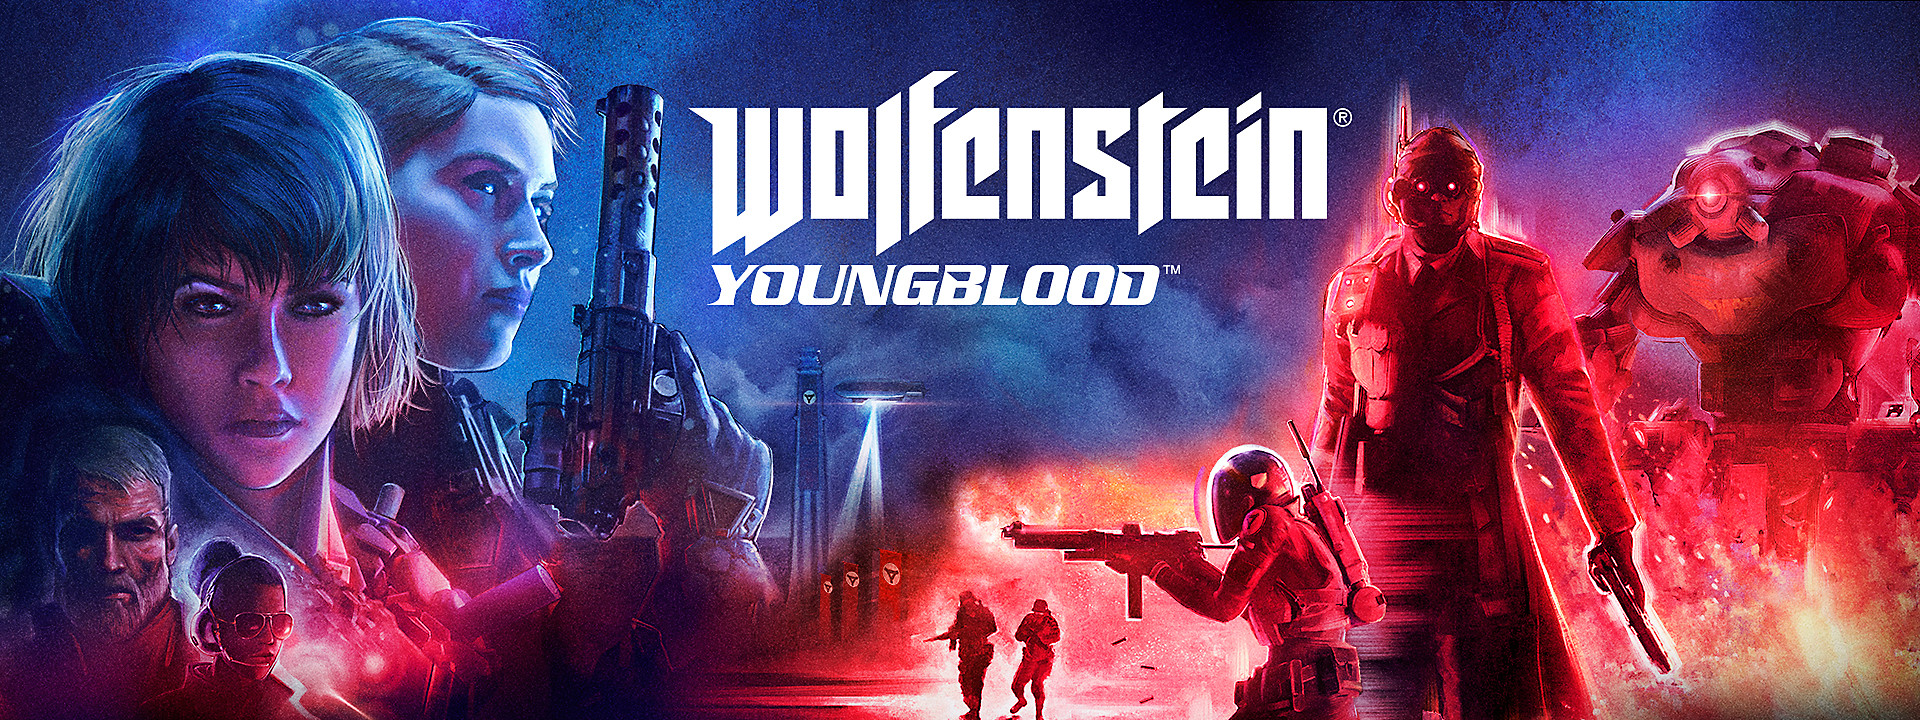 AMD Adds Supports Wolfenstein: Youngblood - Get Adrenalin